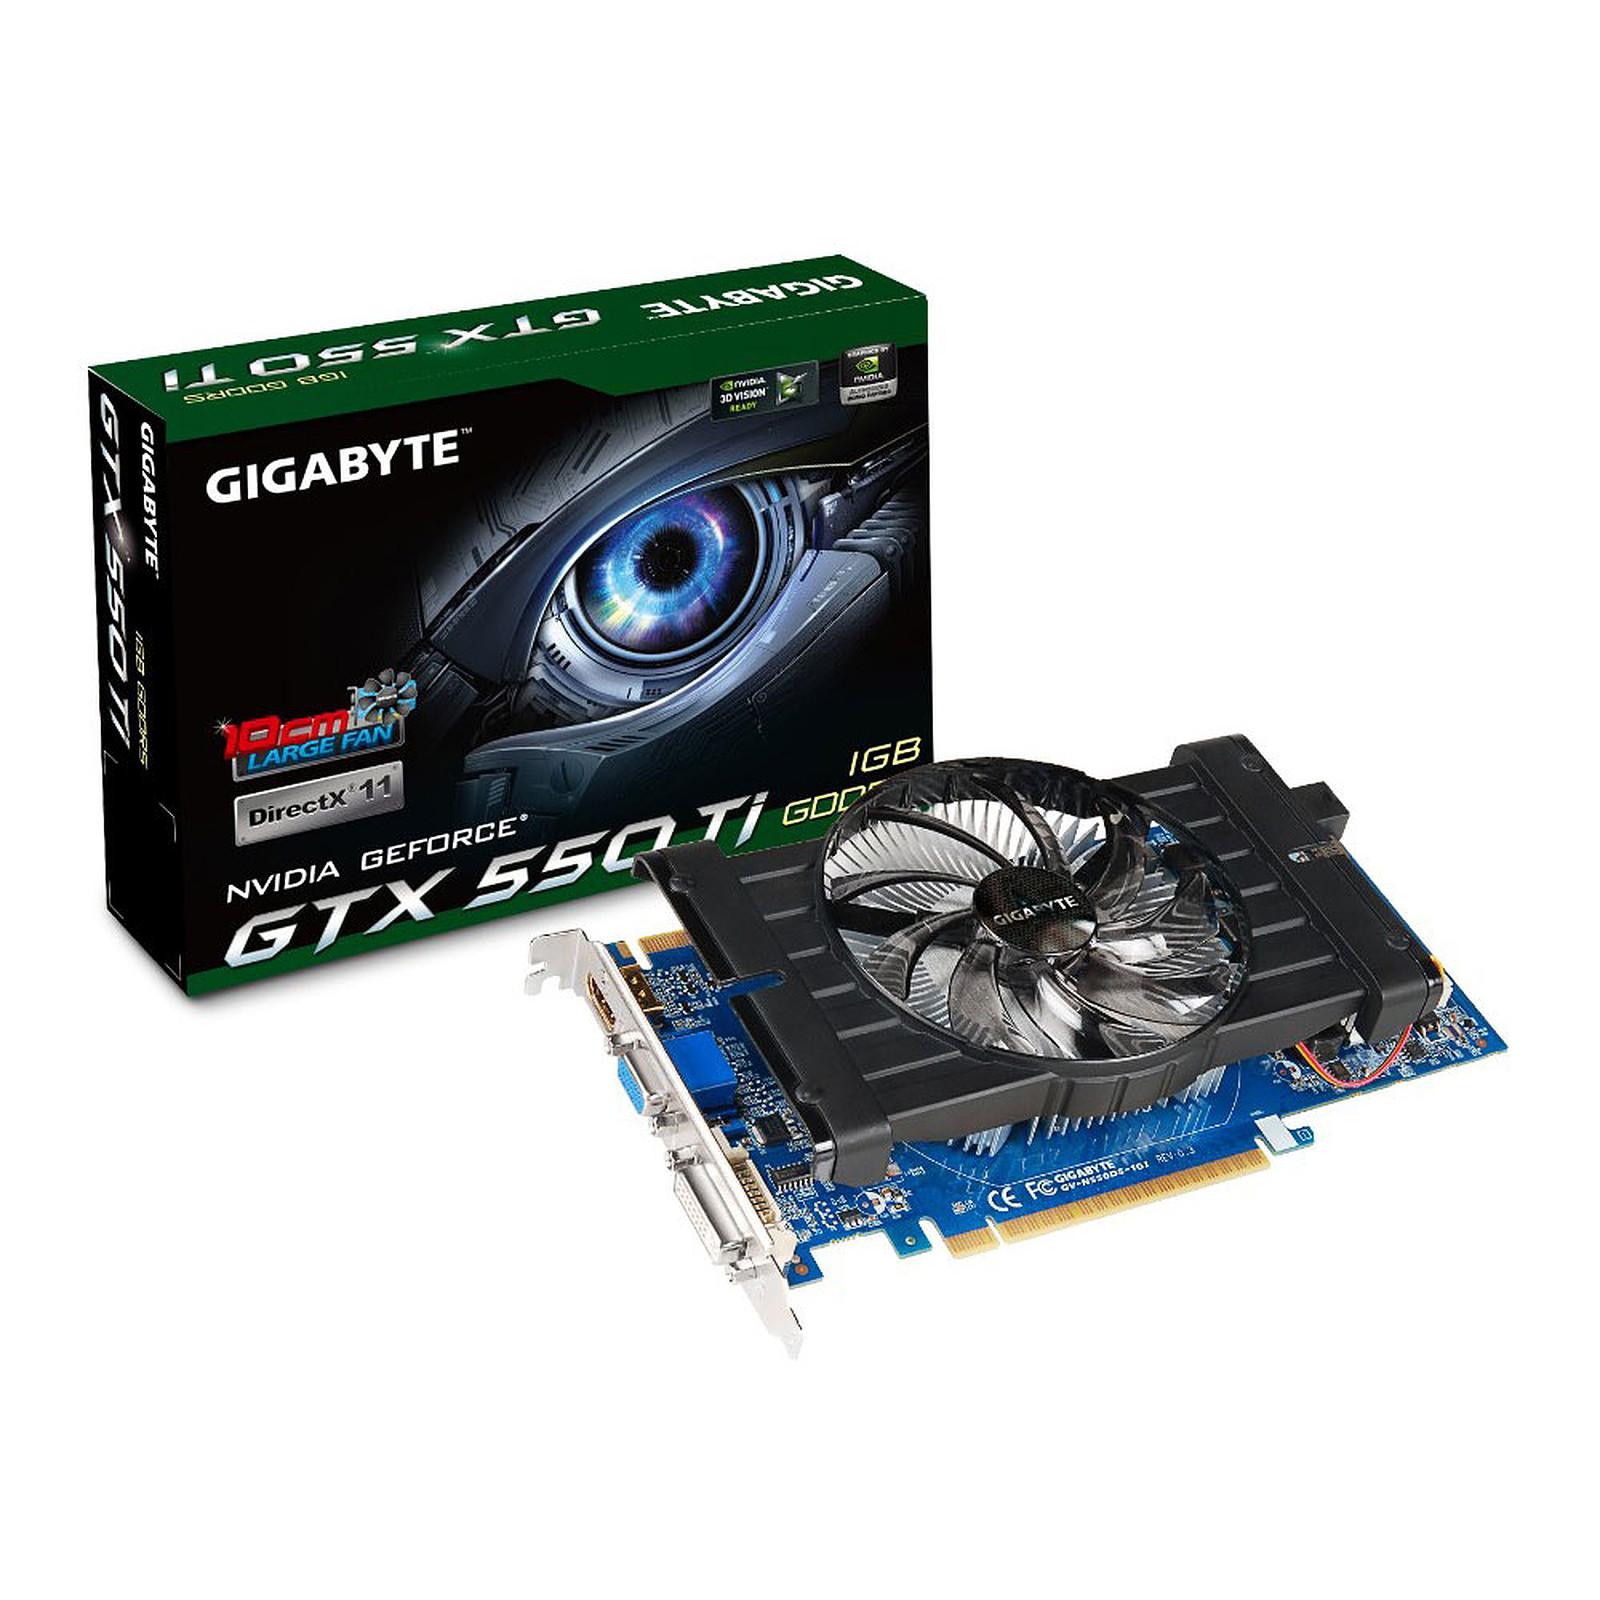 Gigabyte GV-N550D5-1GI GTX 550 Ti 1 Go